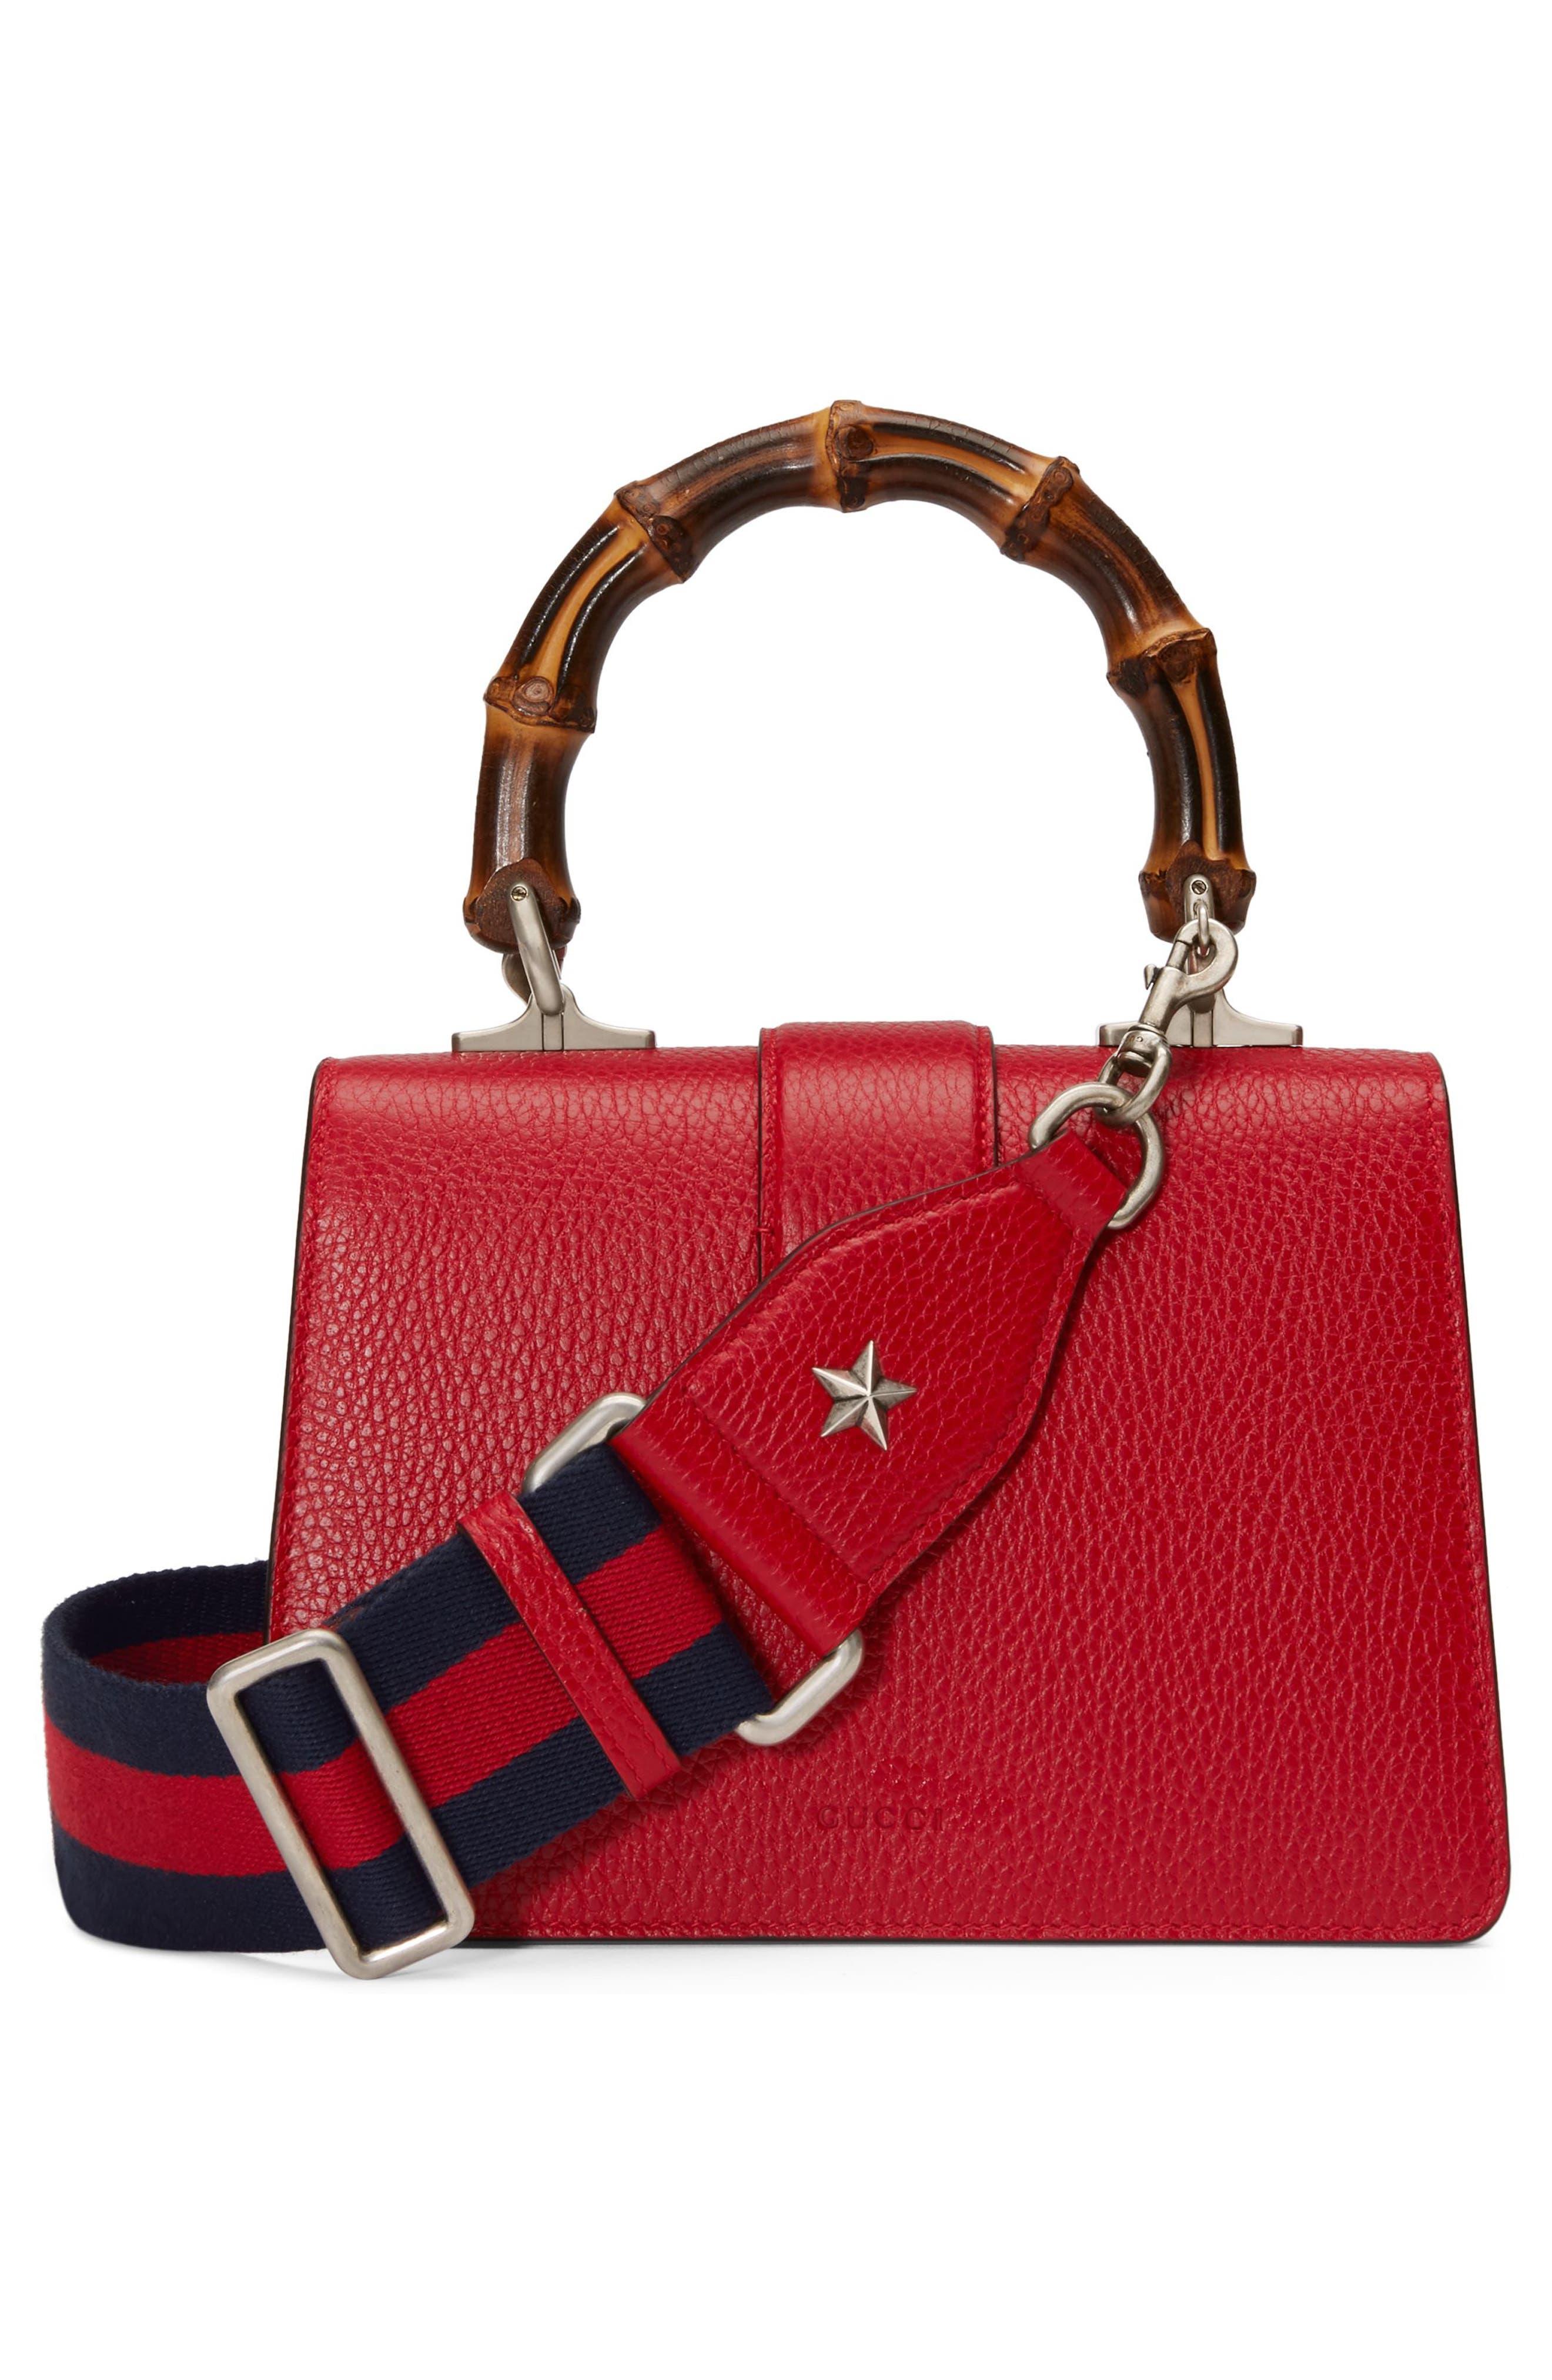 Mini Dionysus Leather Top Handle Satchel,                             Alternate thumbnail 2, color,                             Red/ Blue/ Black Diamond